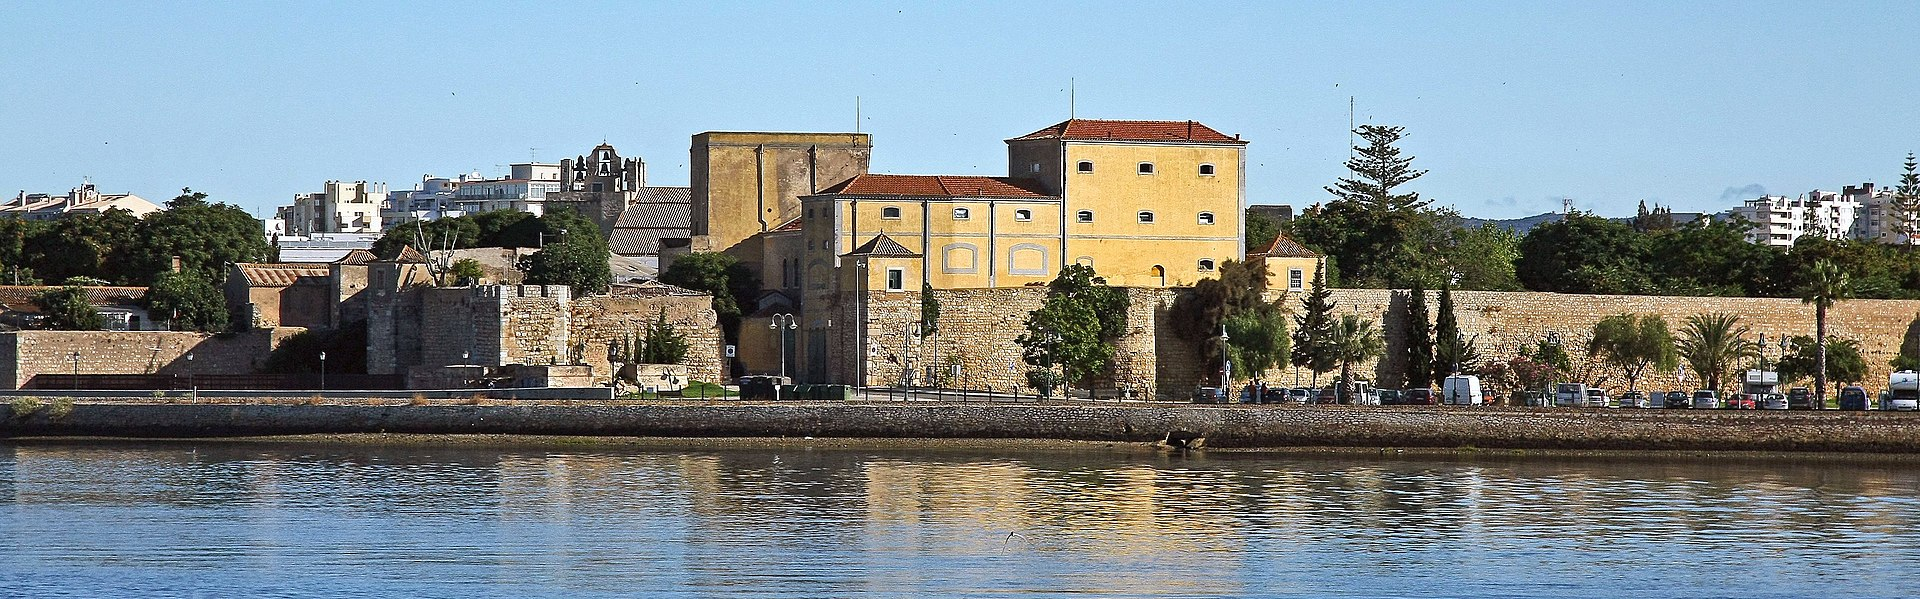 Faro - Portugal (16516337128) (cropped).jpg